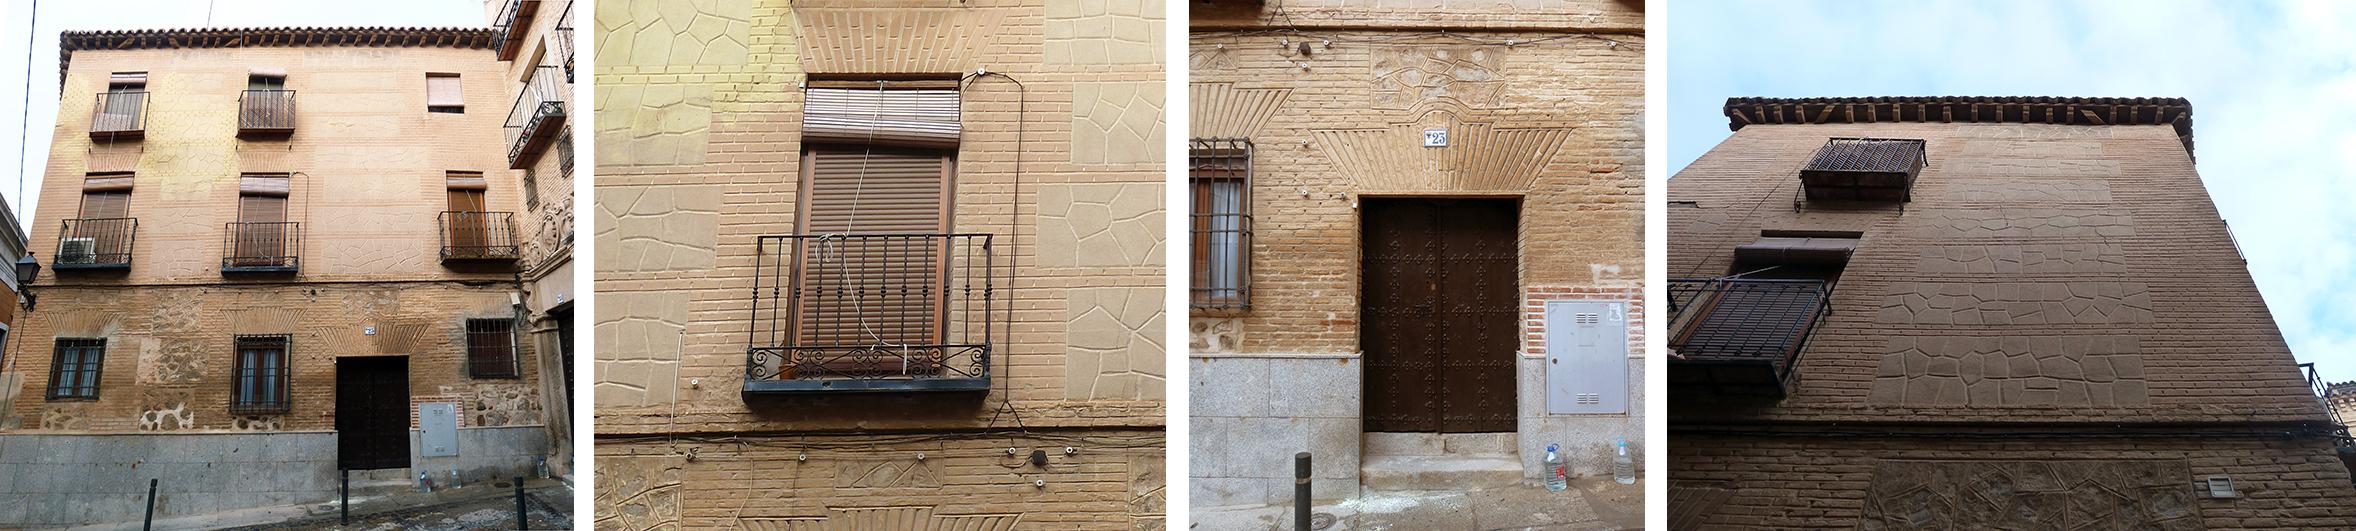 Punta paleta. Composición fachada Instituto 23, Toledo